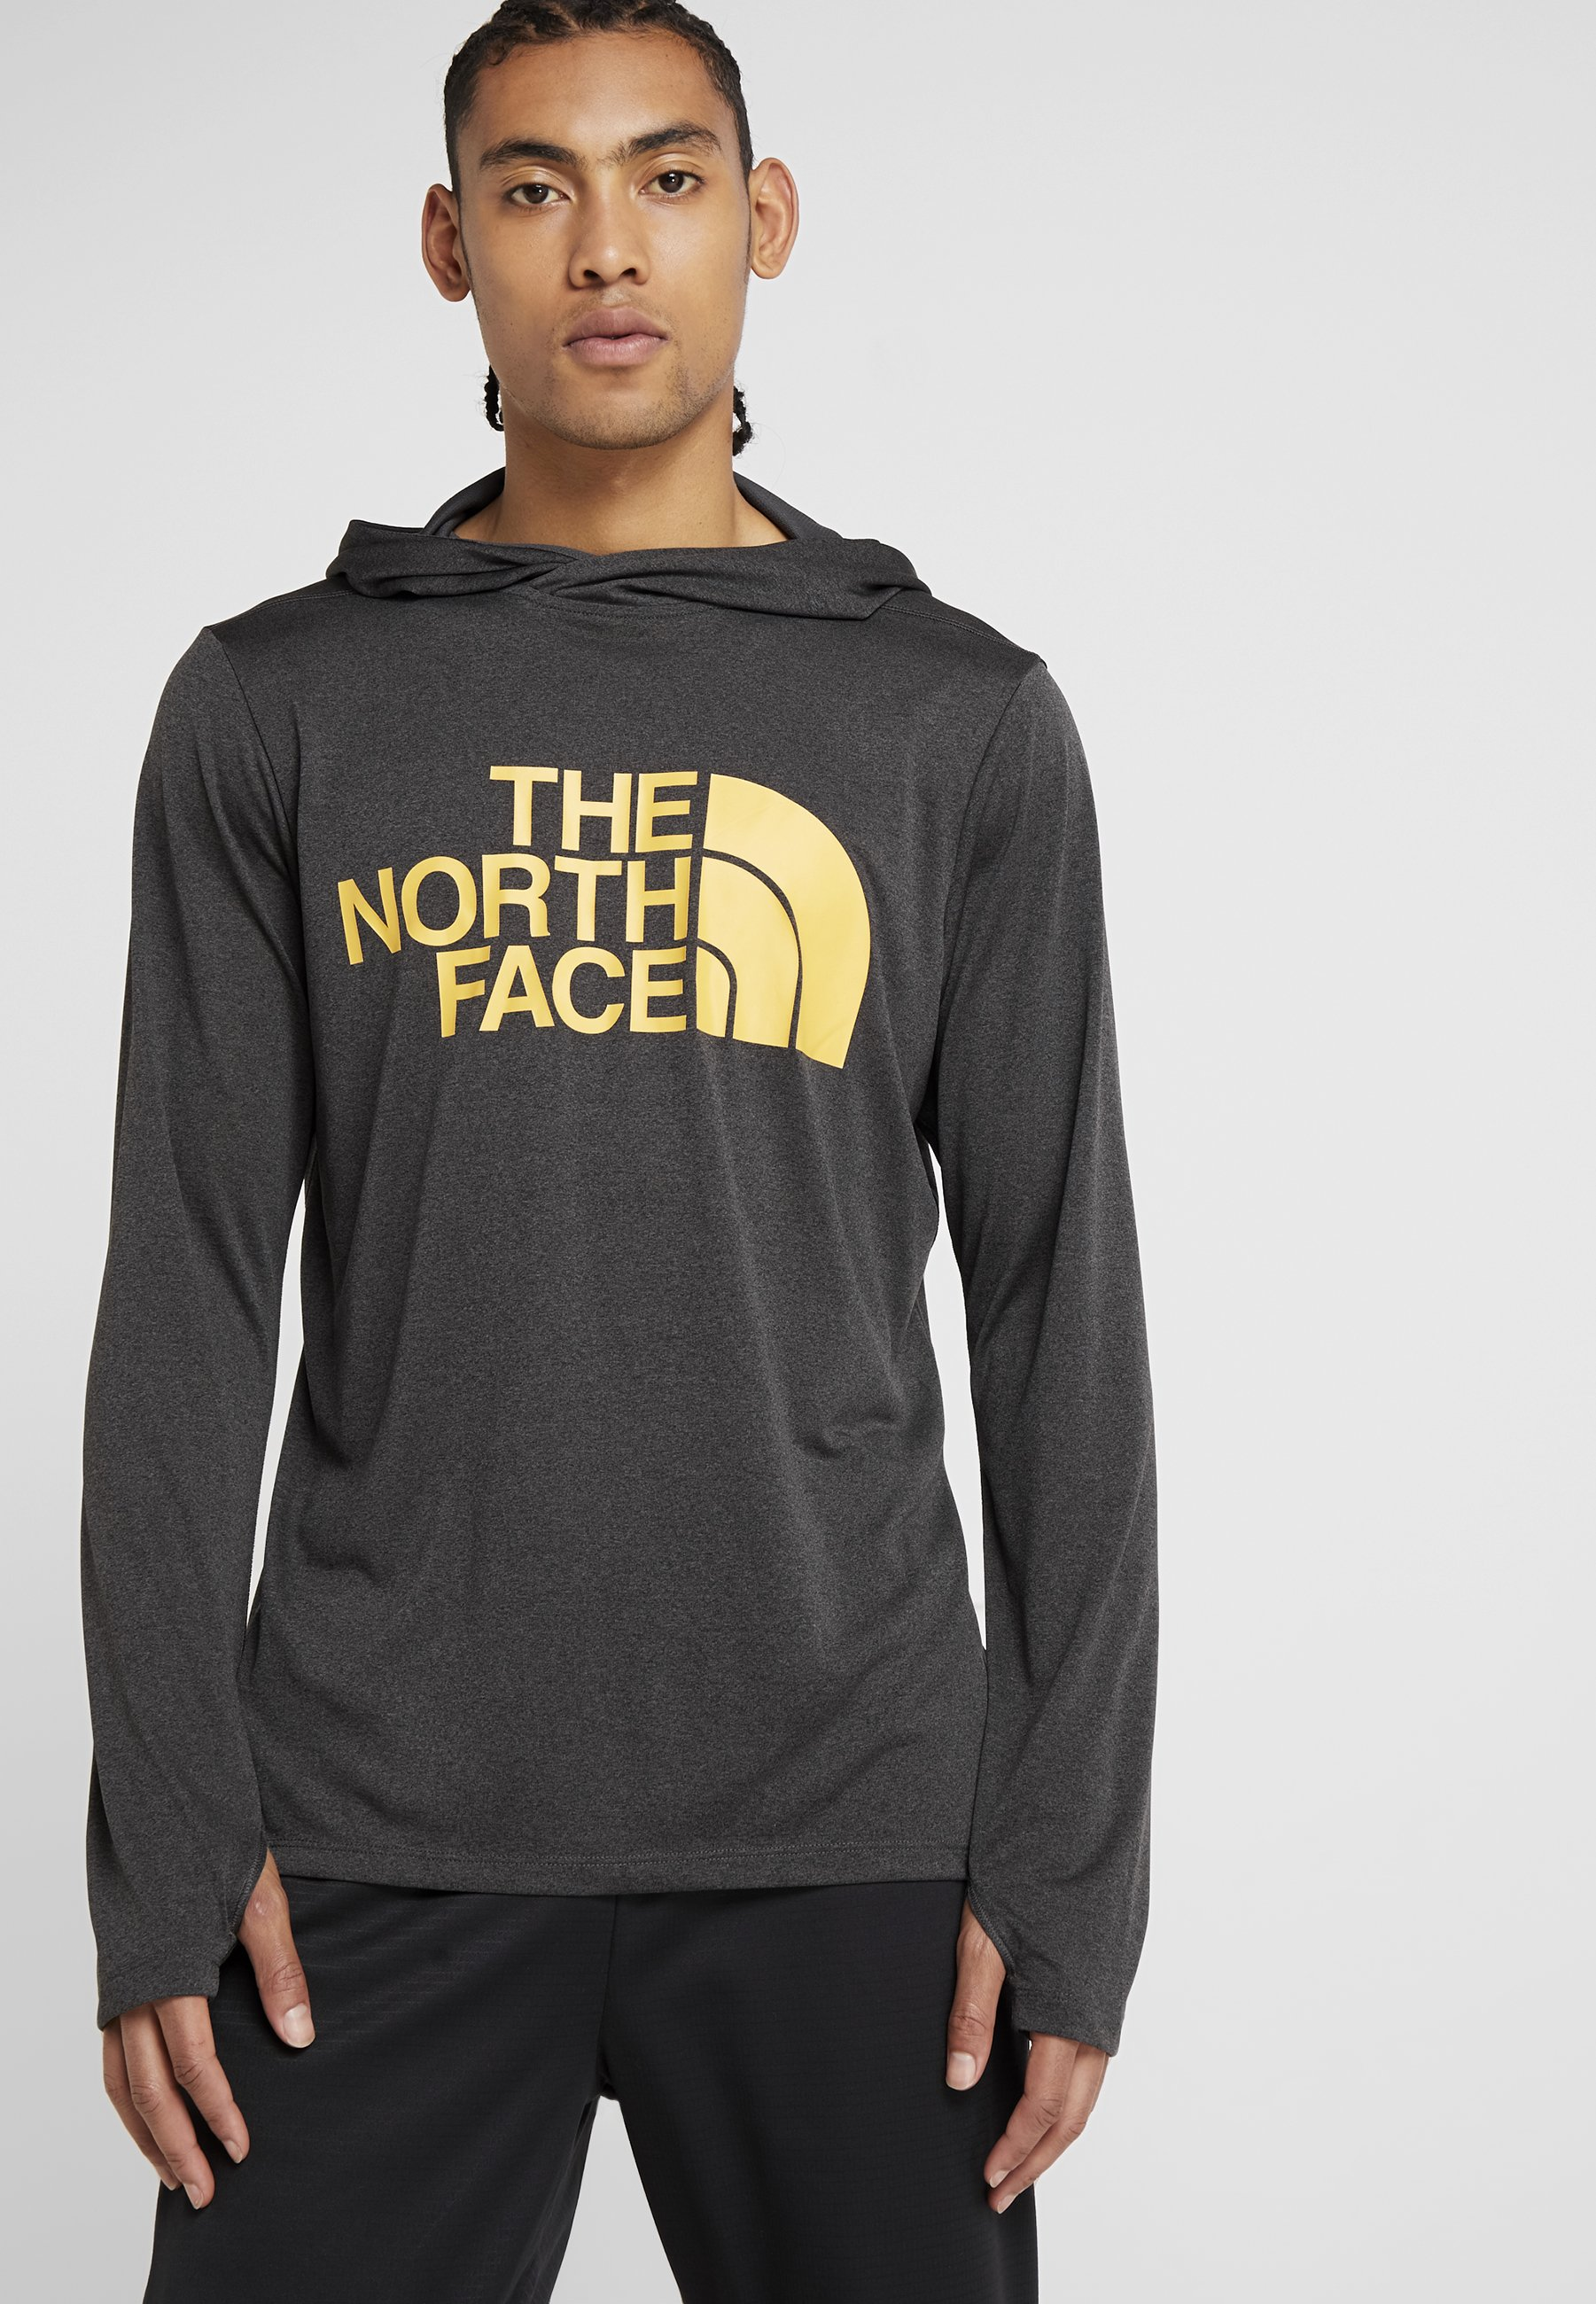 North Face Grey Big LogoT shirt Heather Sport The De Dark qSVUzMp